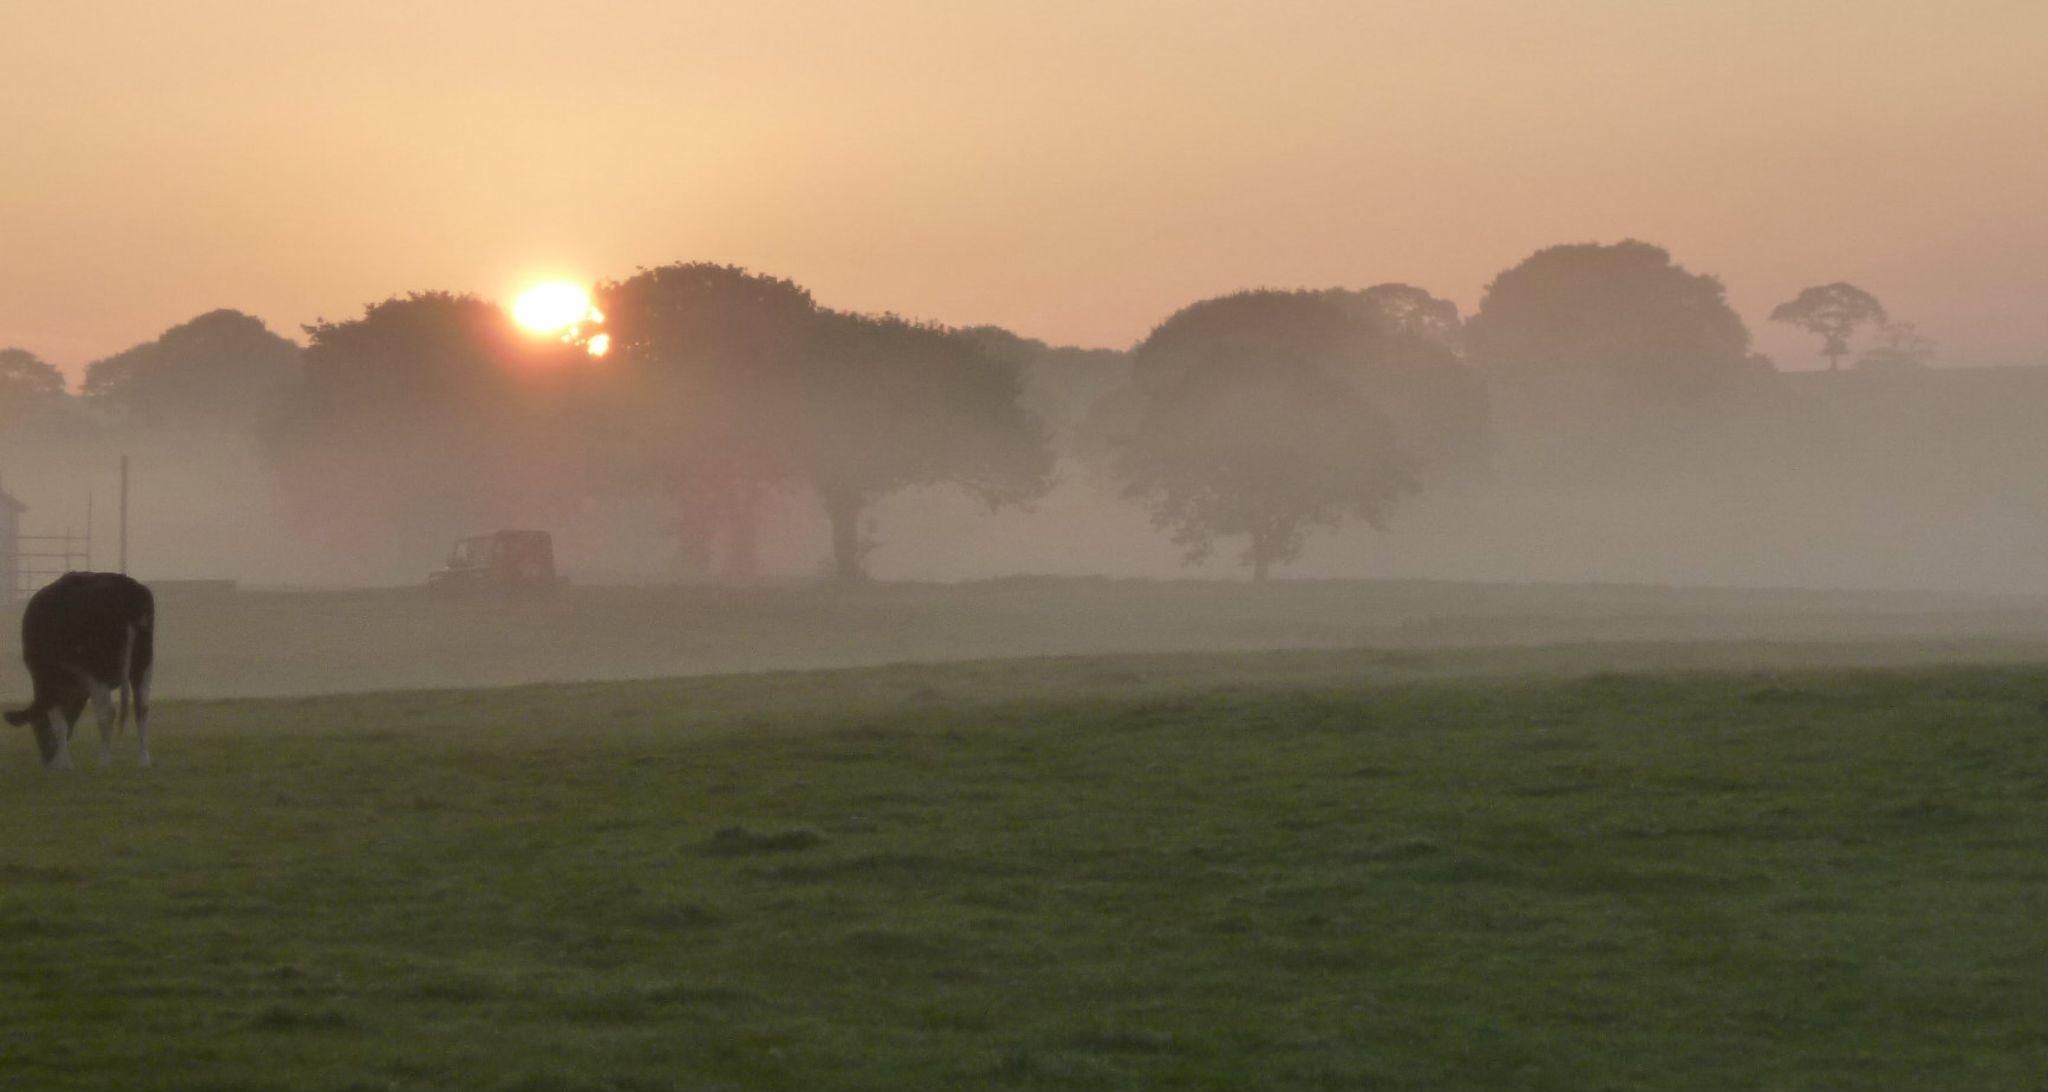 misty sunrise by chris.adams.3557